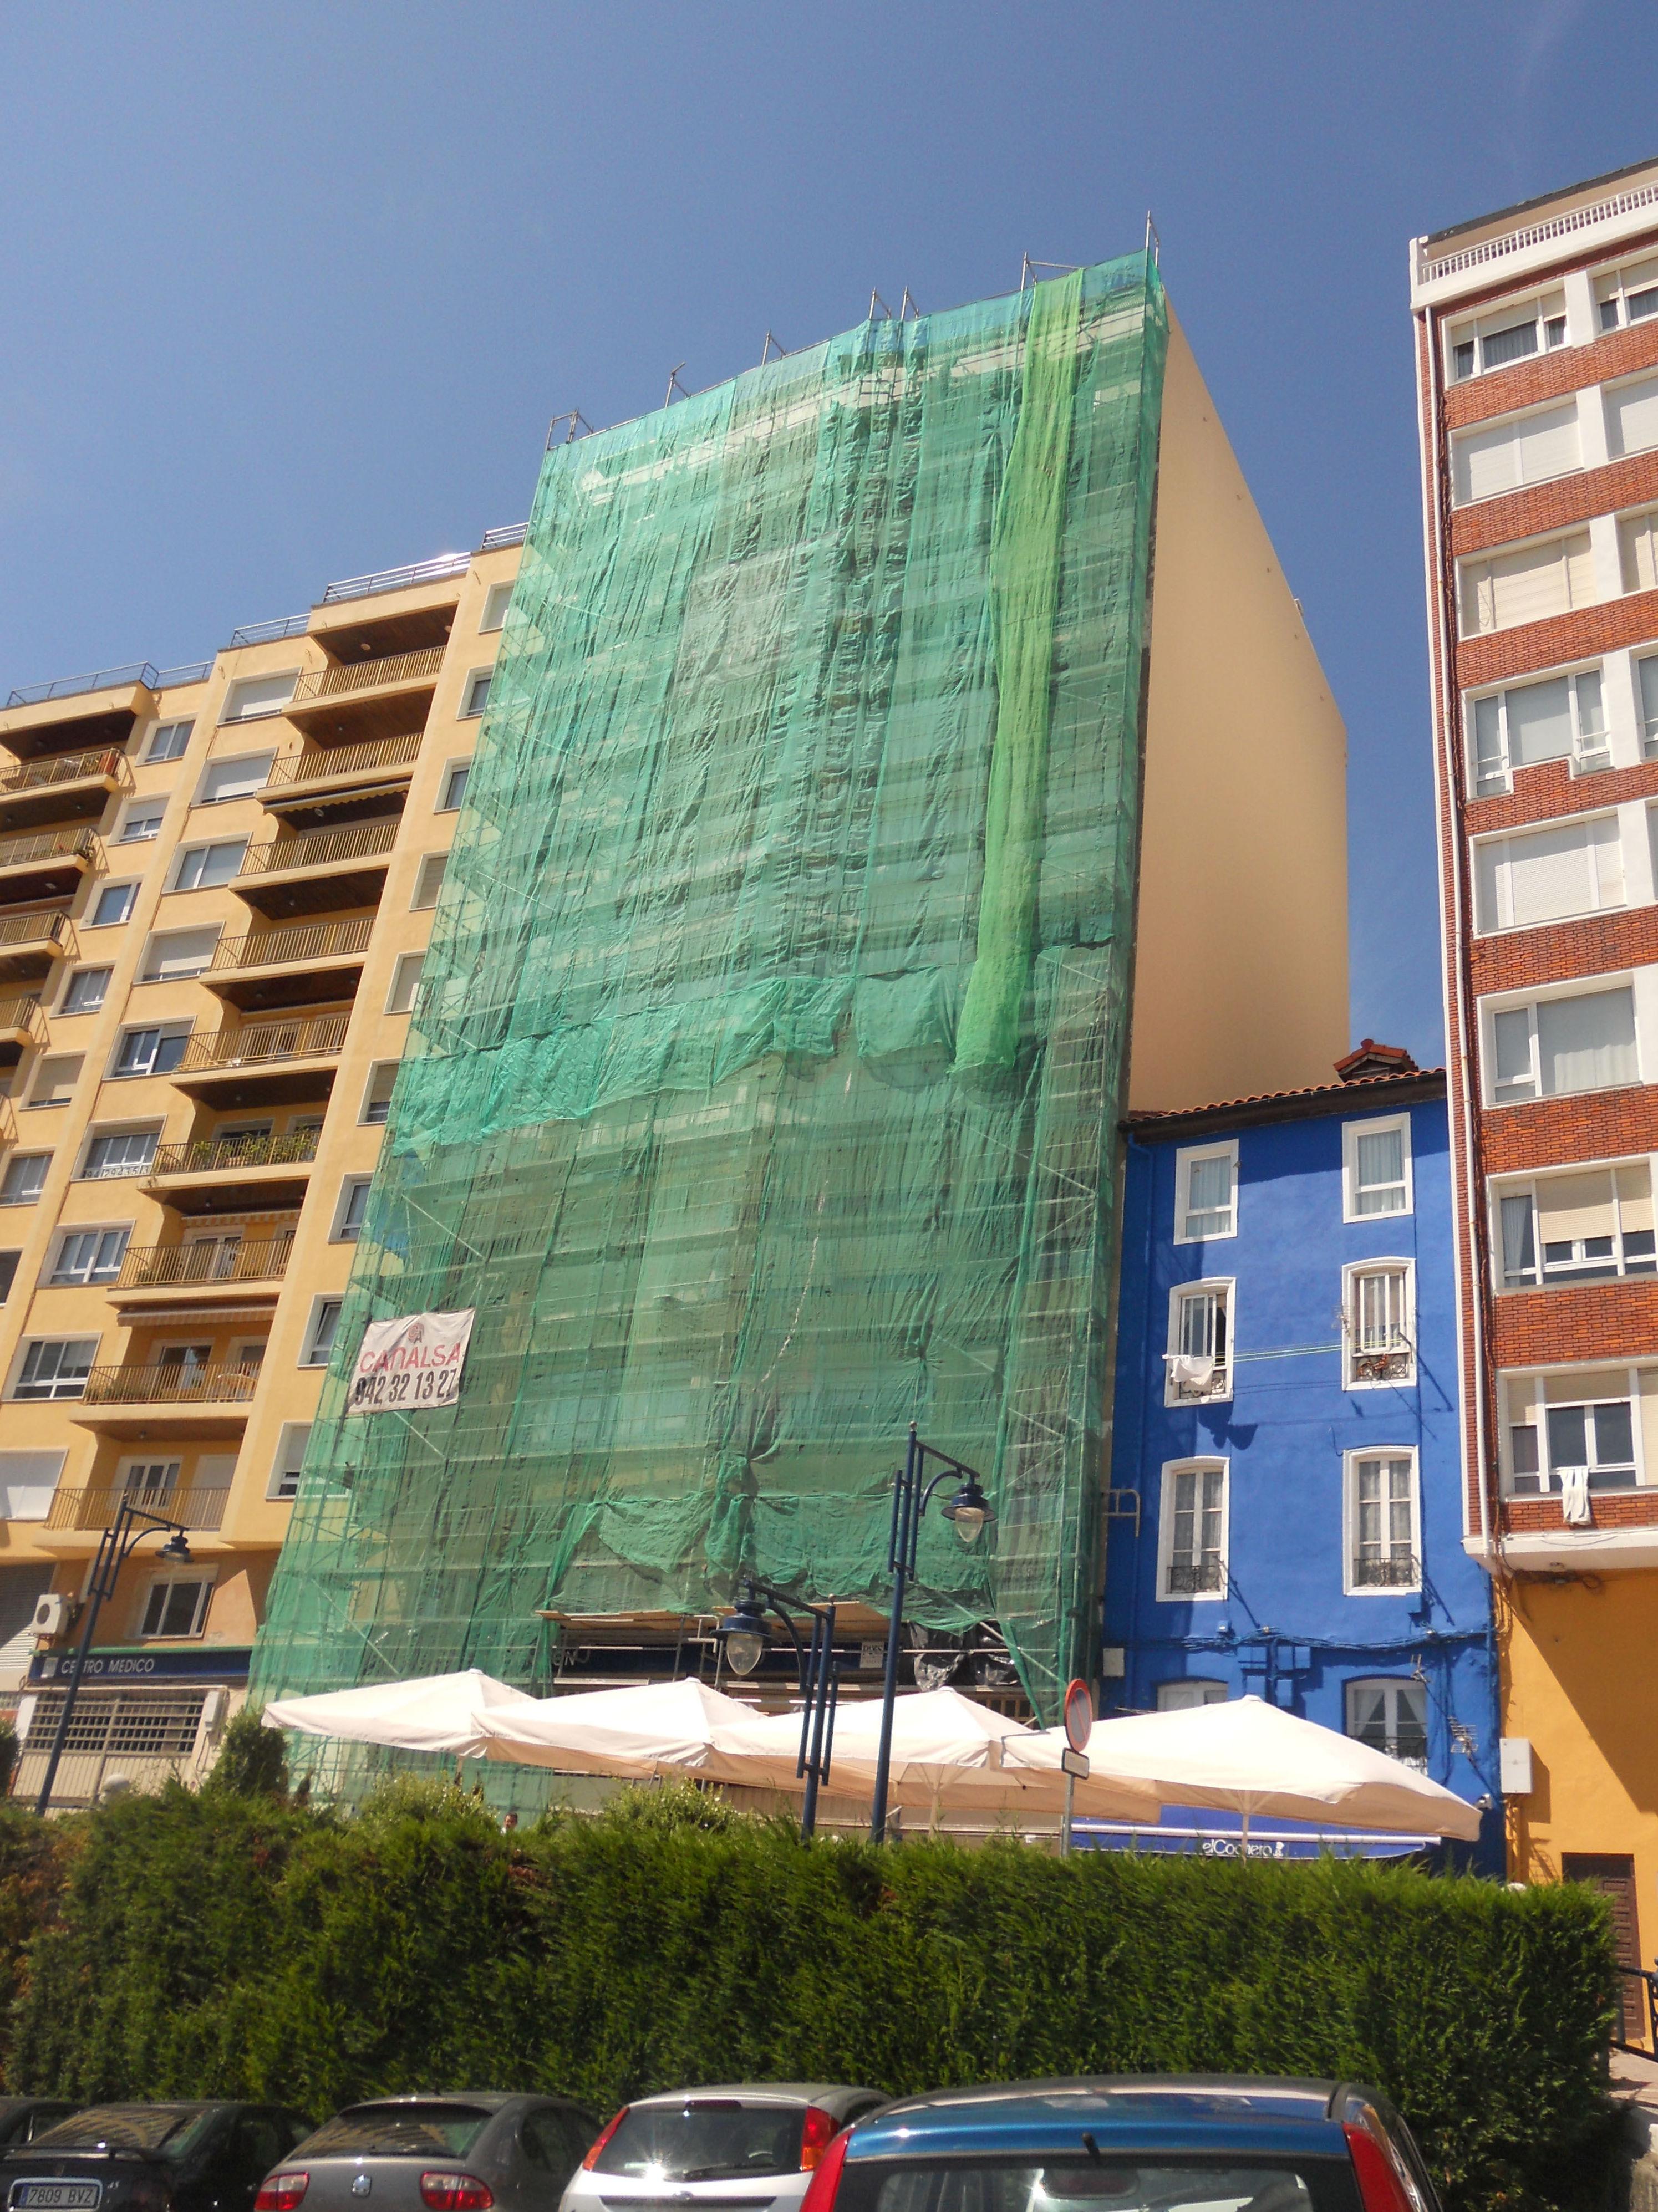 Rhabilitación con andamio modular en Santander.